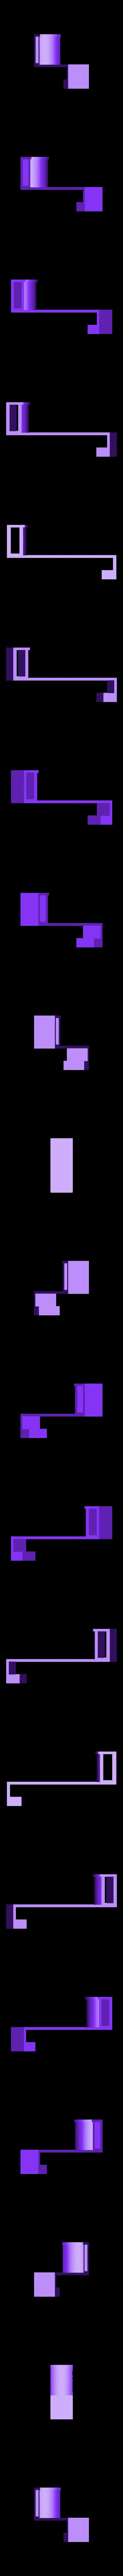 support bobine.stl Download STL file reel stand for DA VINCI 1.0 pro • 3D printer template, bucker